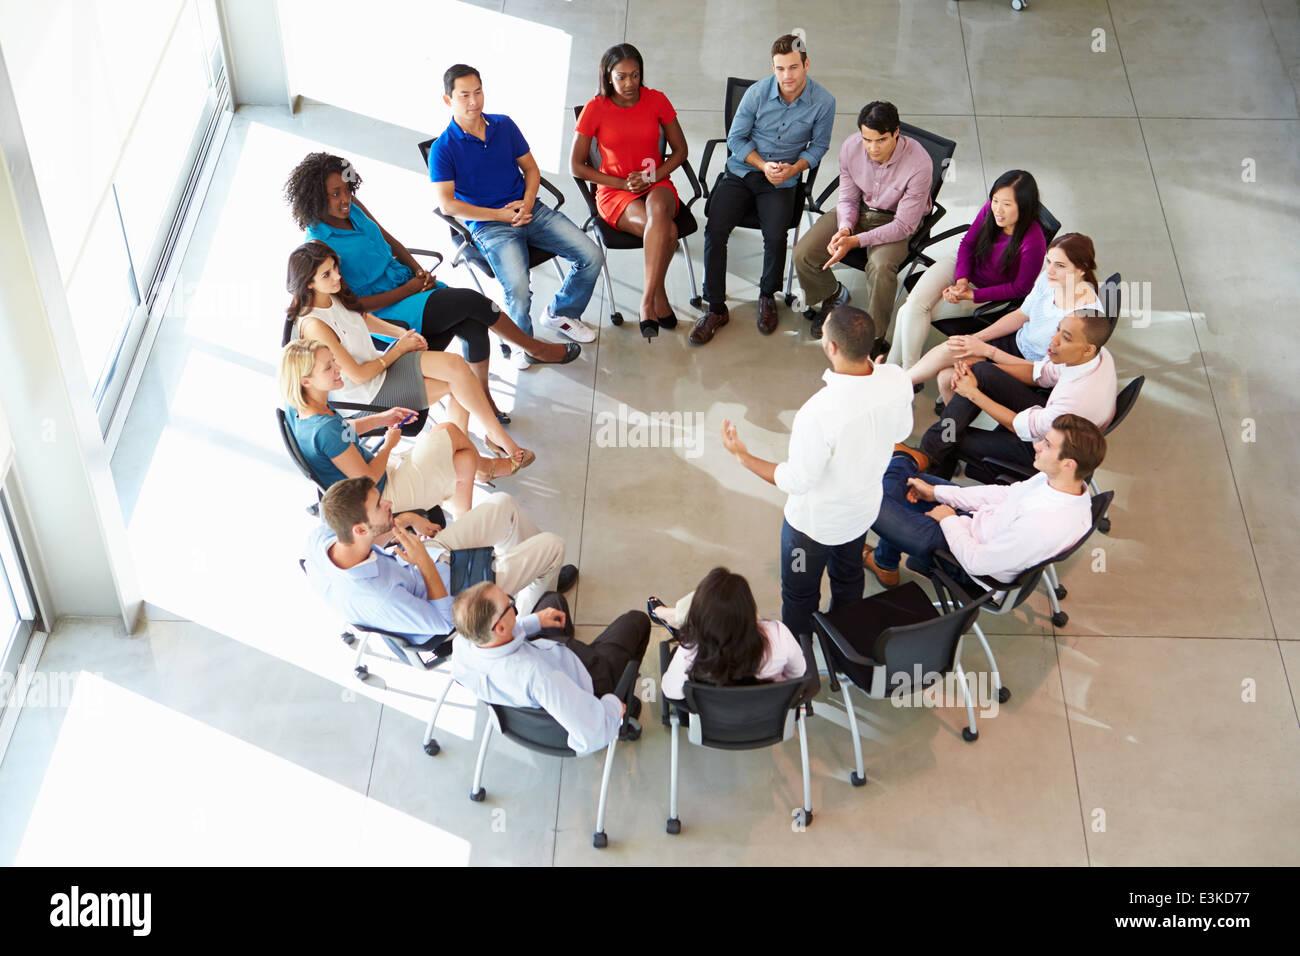 Geschäftsmann, Multi-Kulti-Büro Mitarbeiterversammlung Adressierung Stockbild